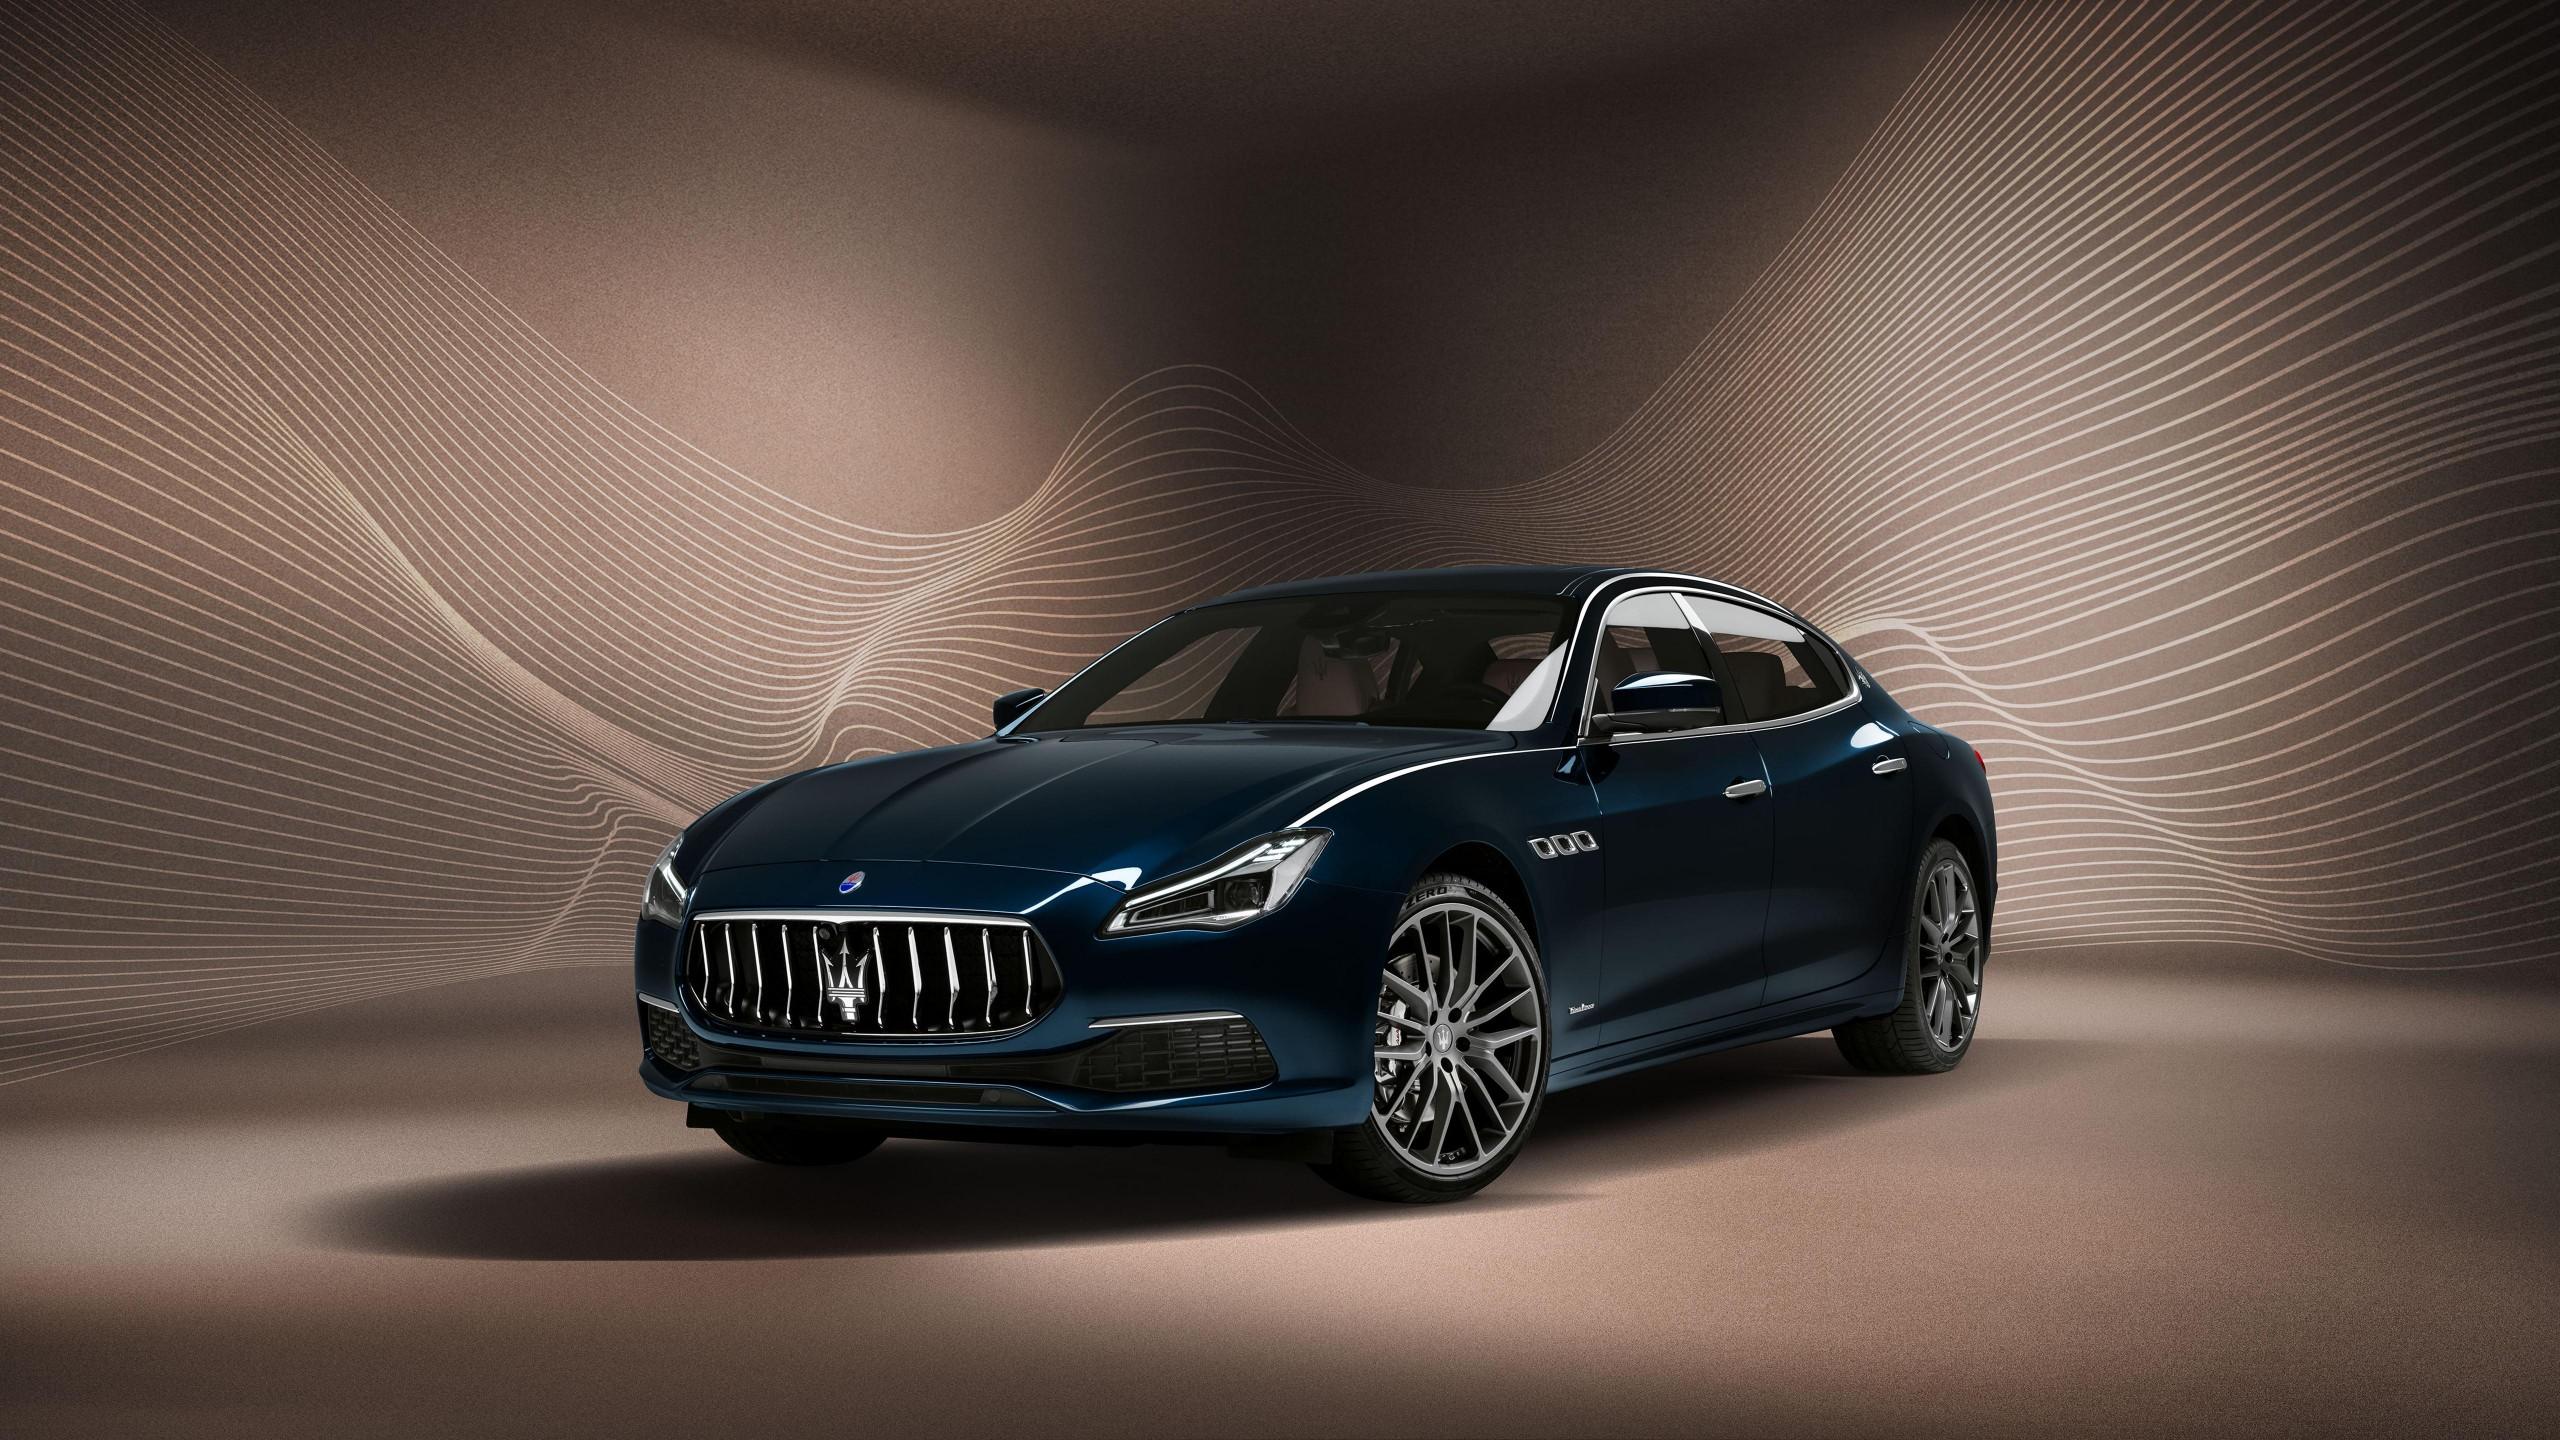 Maserati Quattroporte GranLusso Royale 2020 5K HD desktop 2560x1440